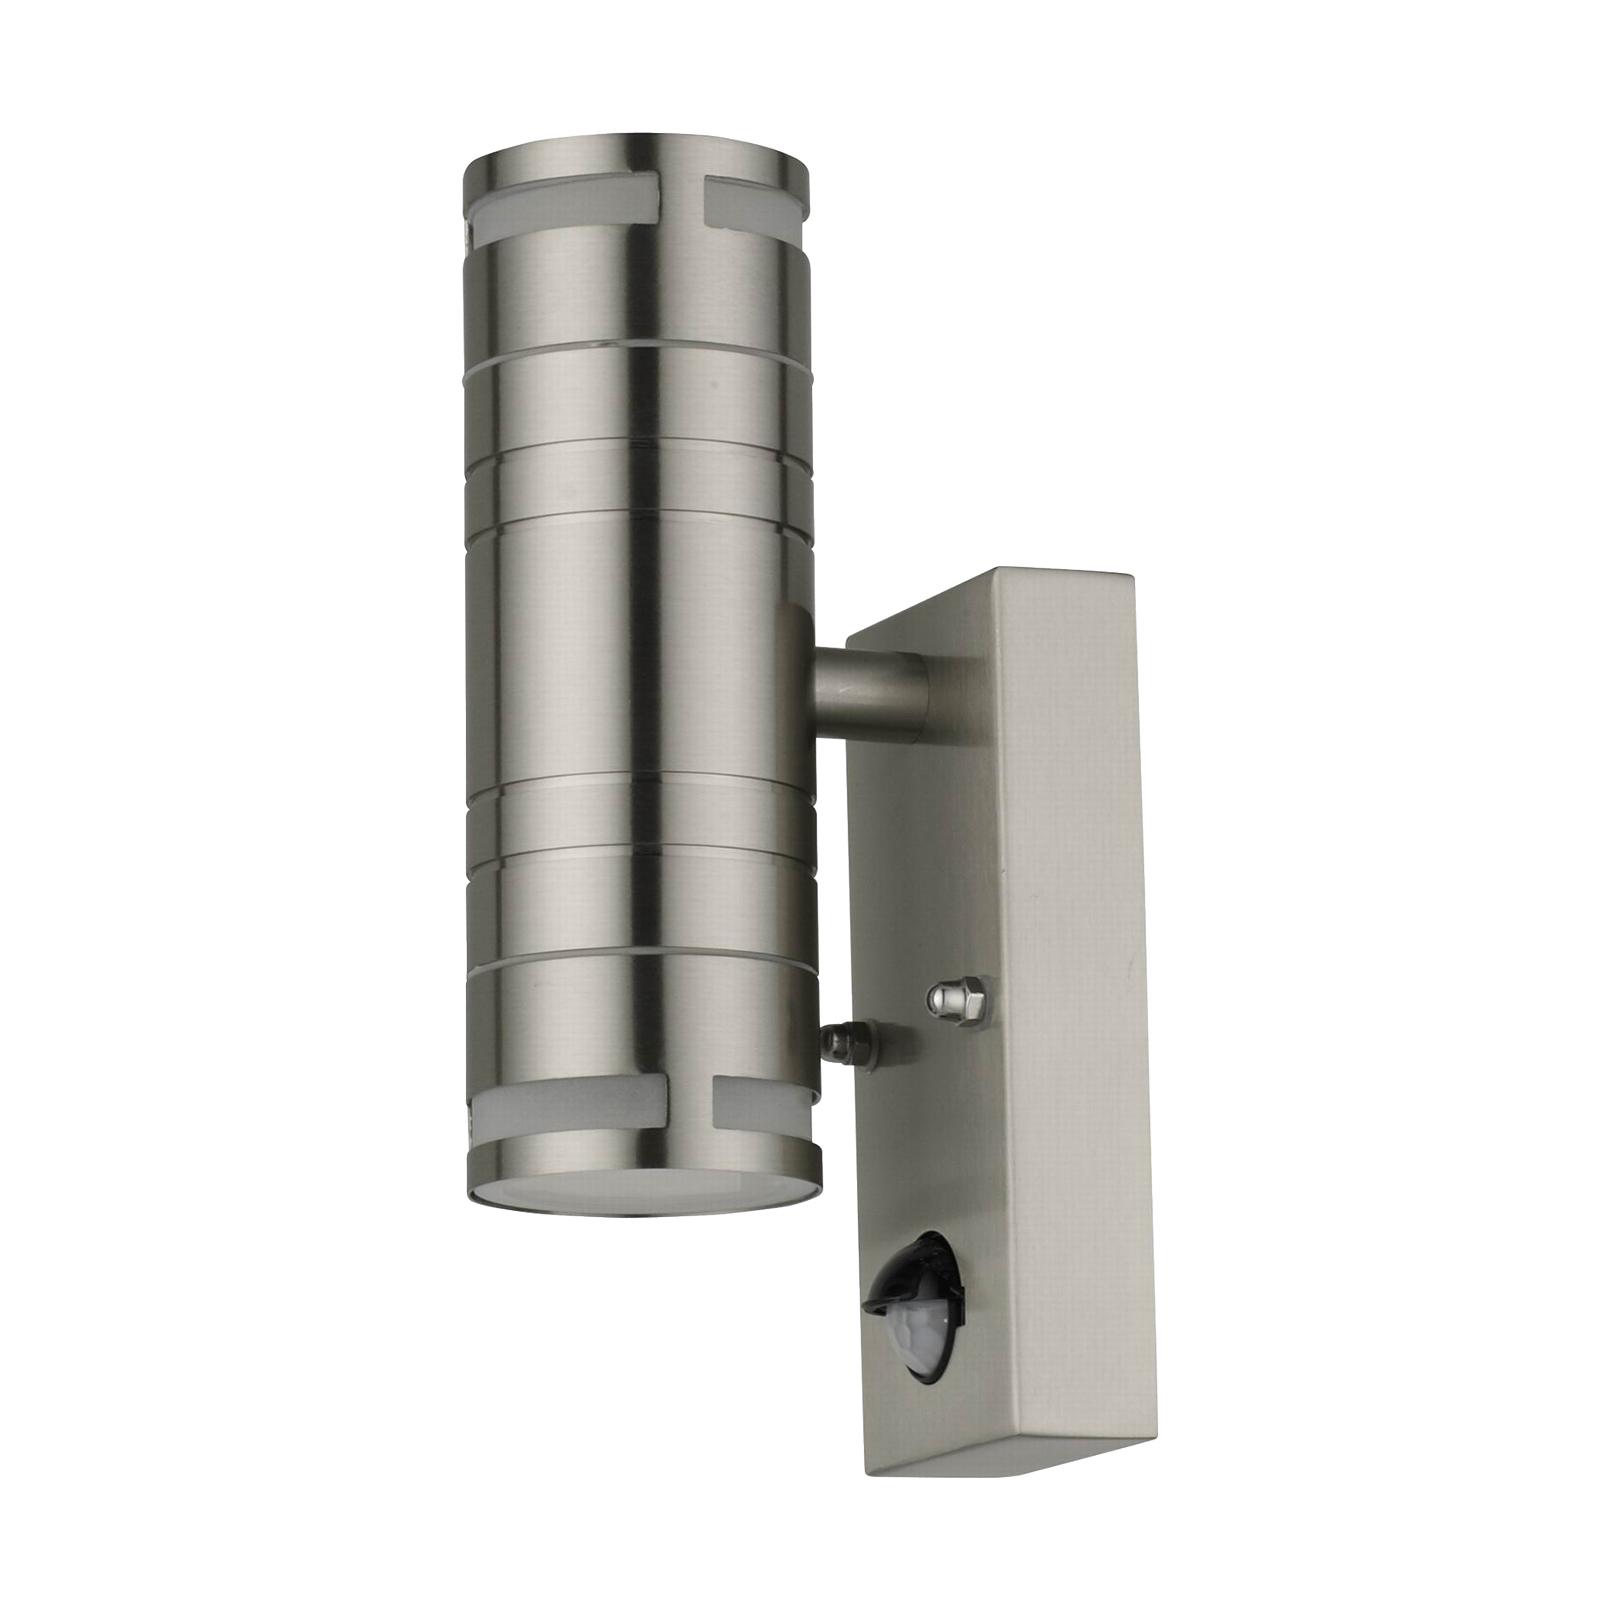 Lindby Catalin buitenwandlamp, sensor, 2-lamps